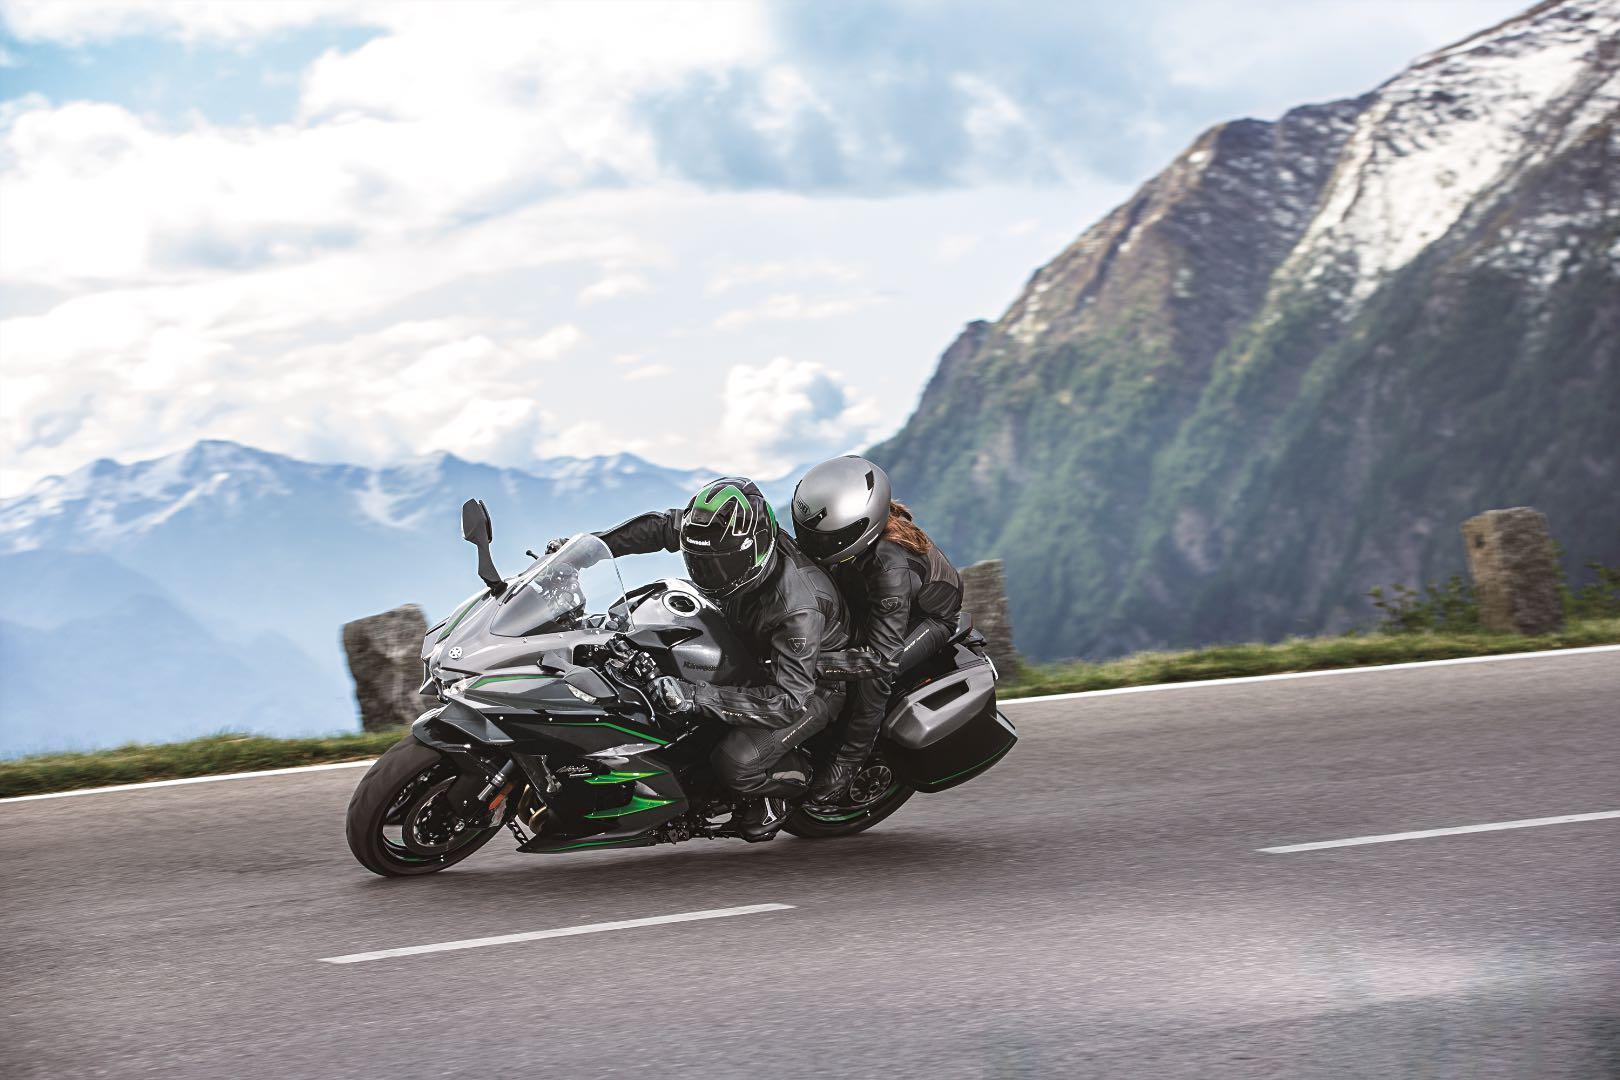 2019 Kawasaki H2 SX SE+ two up touring